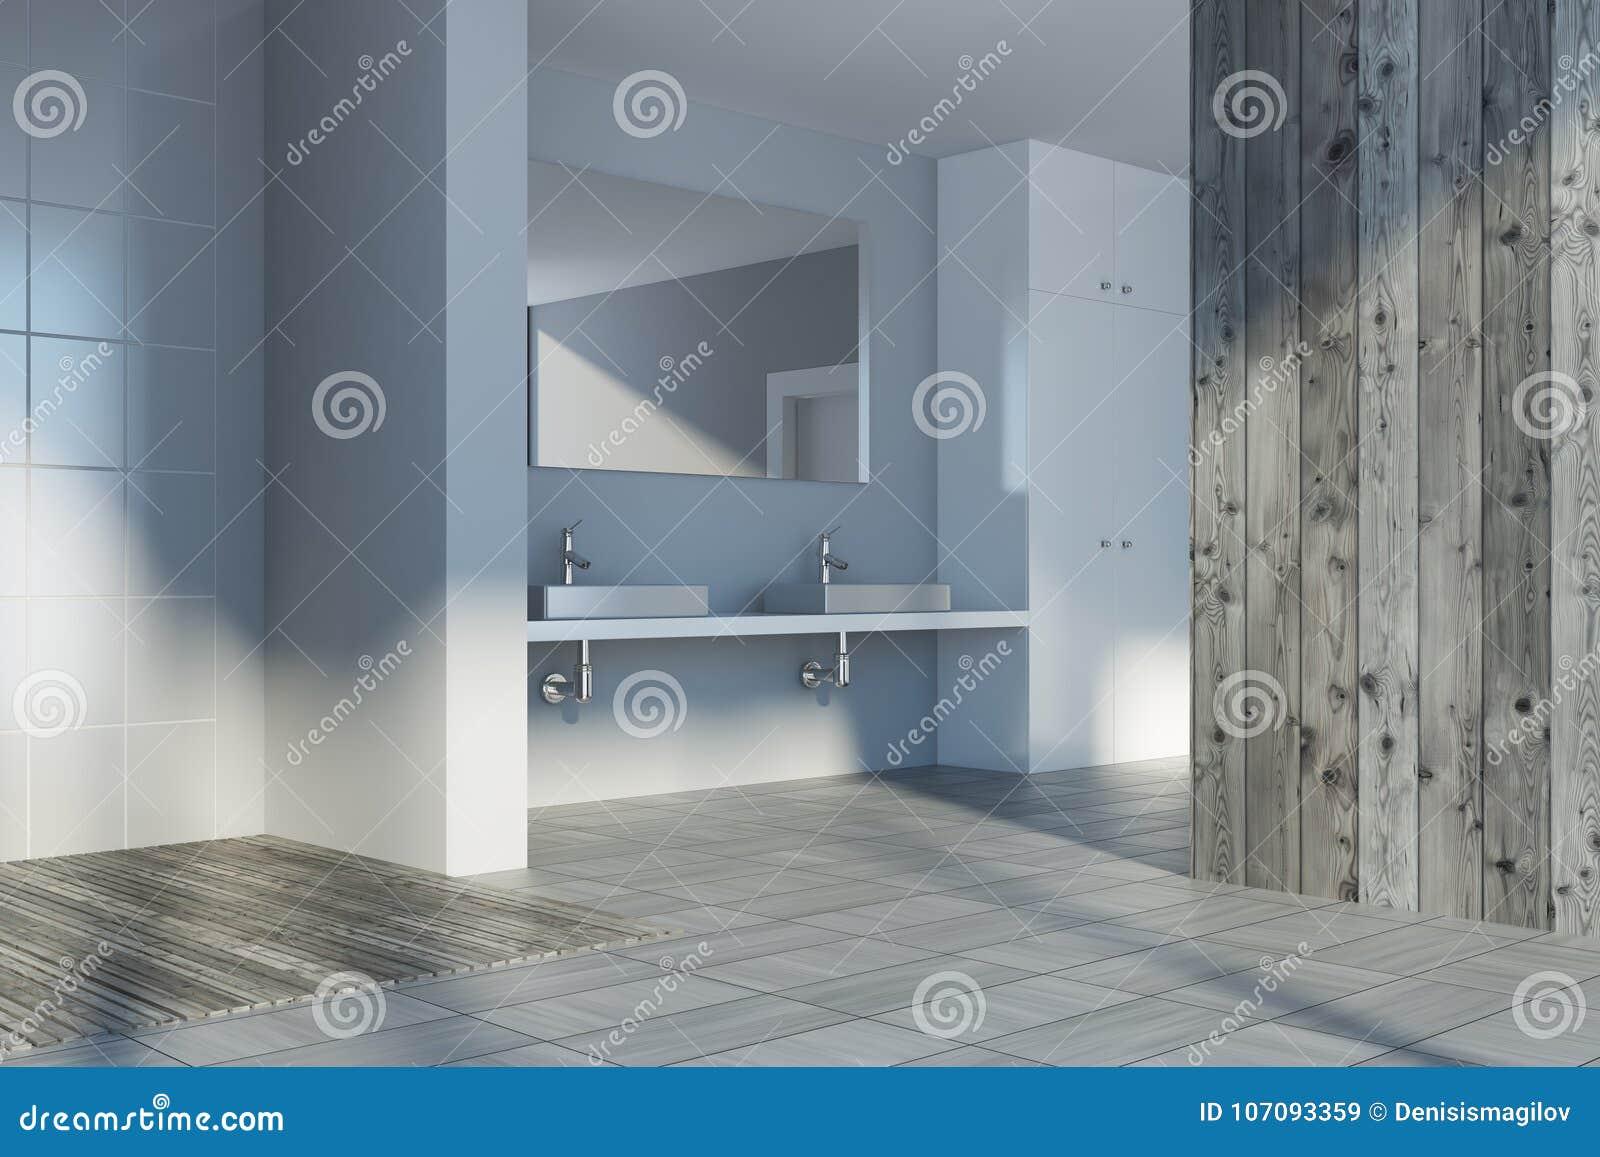 Wooden Bathroom Corner, Double Sink Stock Illustration ...